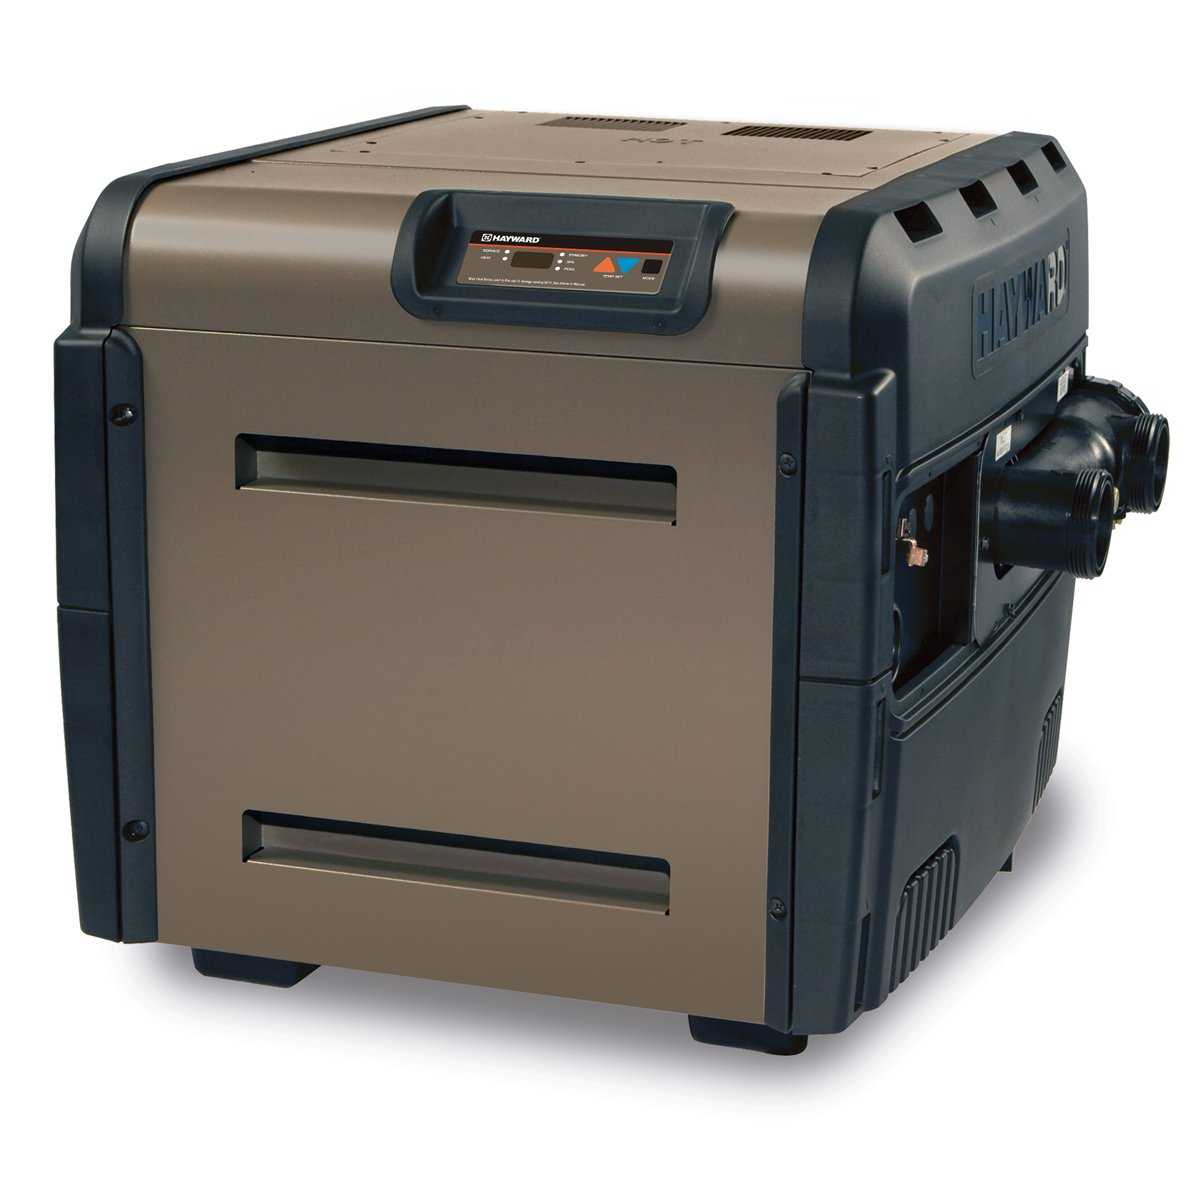 Hayward H250FDN Universal H-Series 250,000 BTU Pool and Spa Heater, Natural Gas, Low Nox